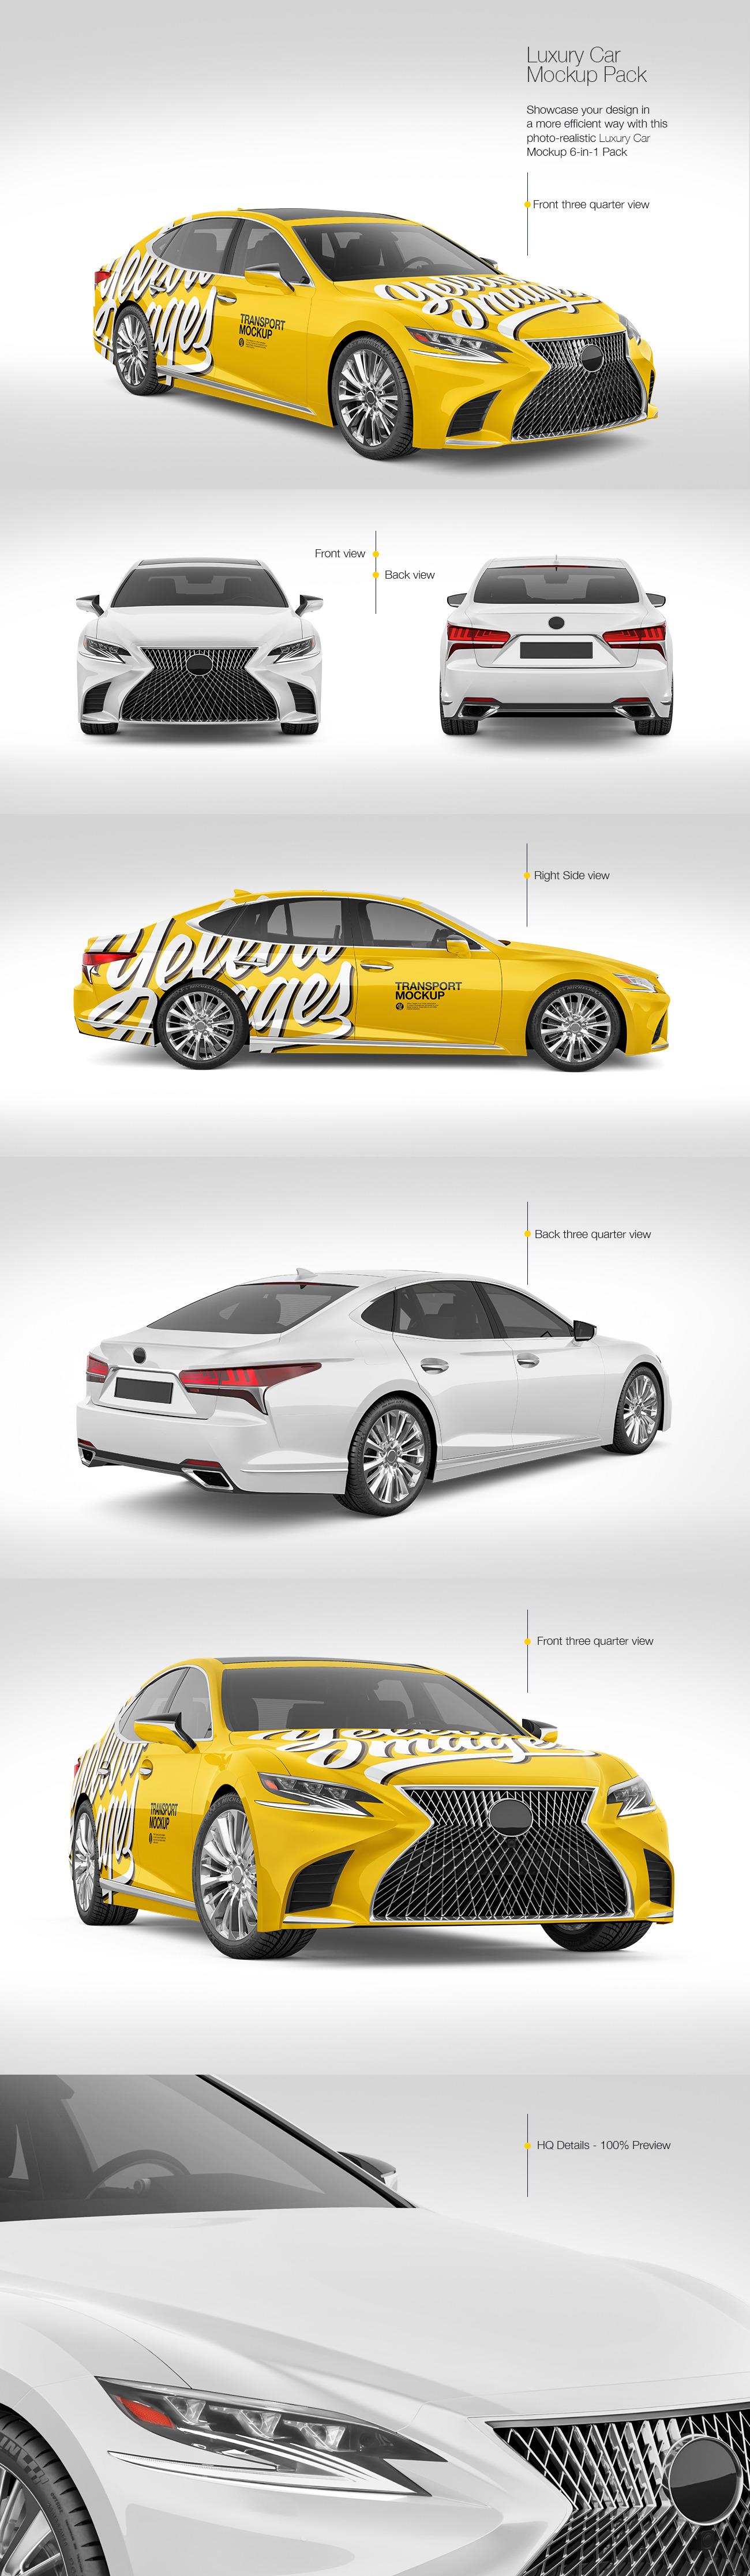 Luxury Car Mockup Pack